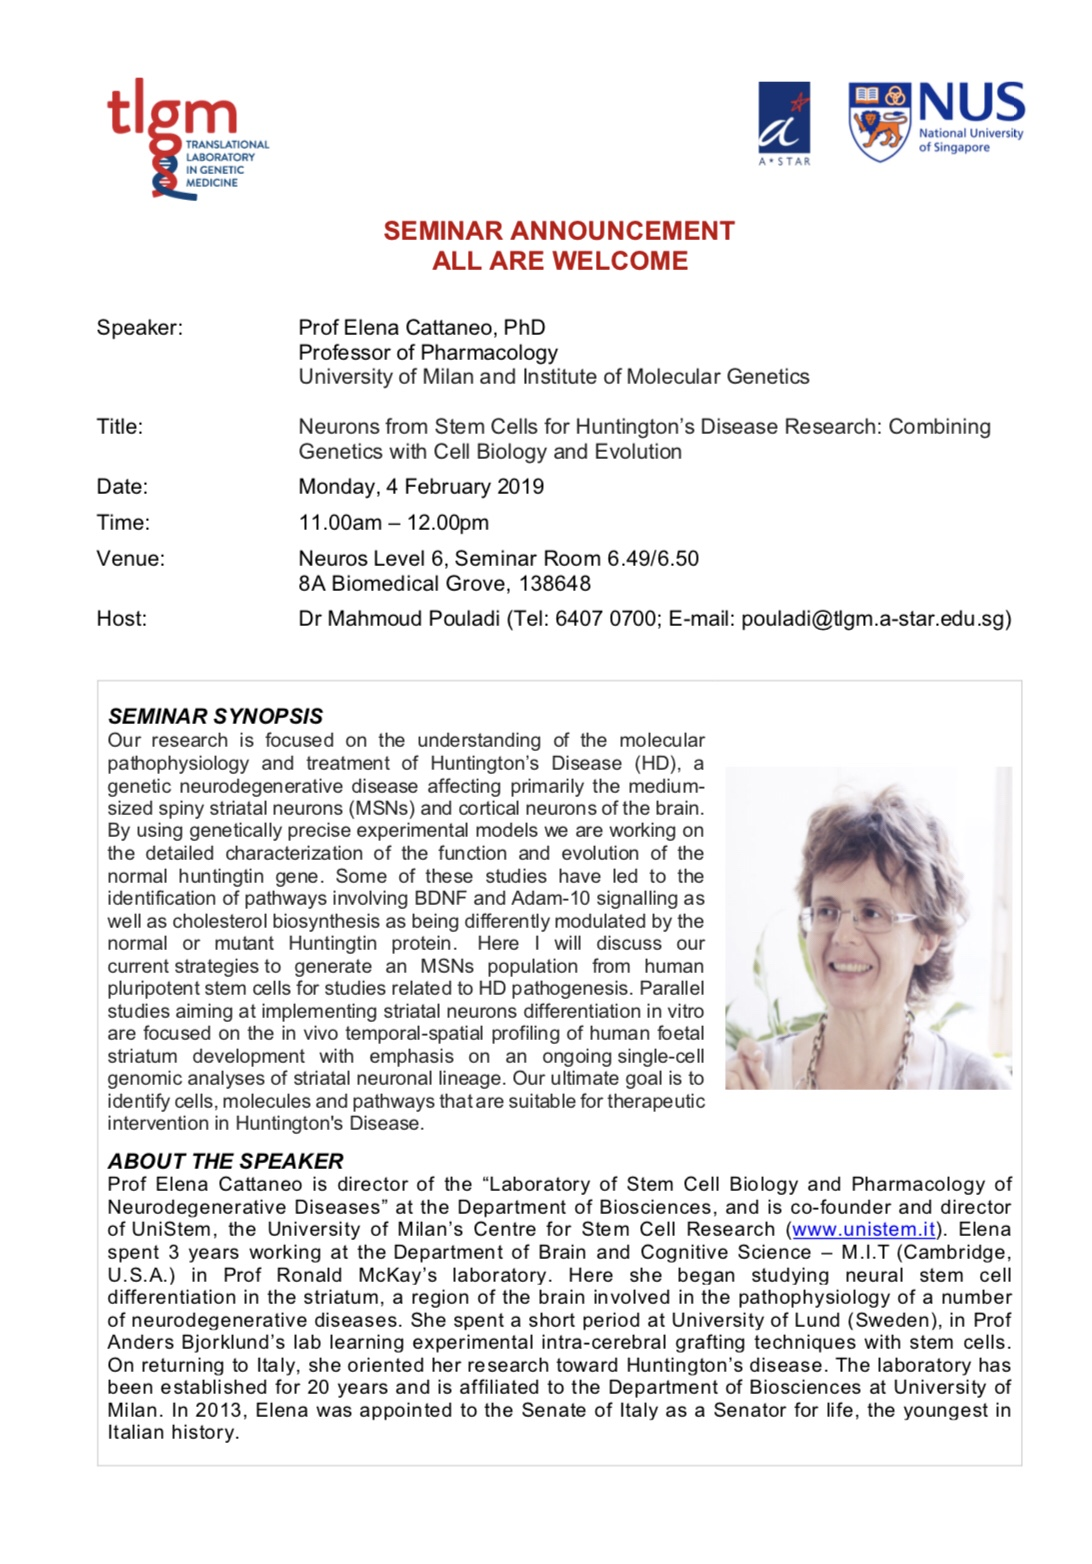 Prof Cattaneo's seminar on Huntington disease